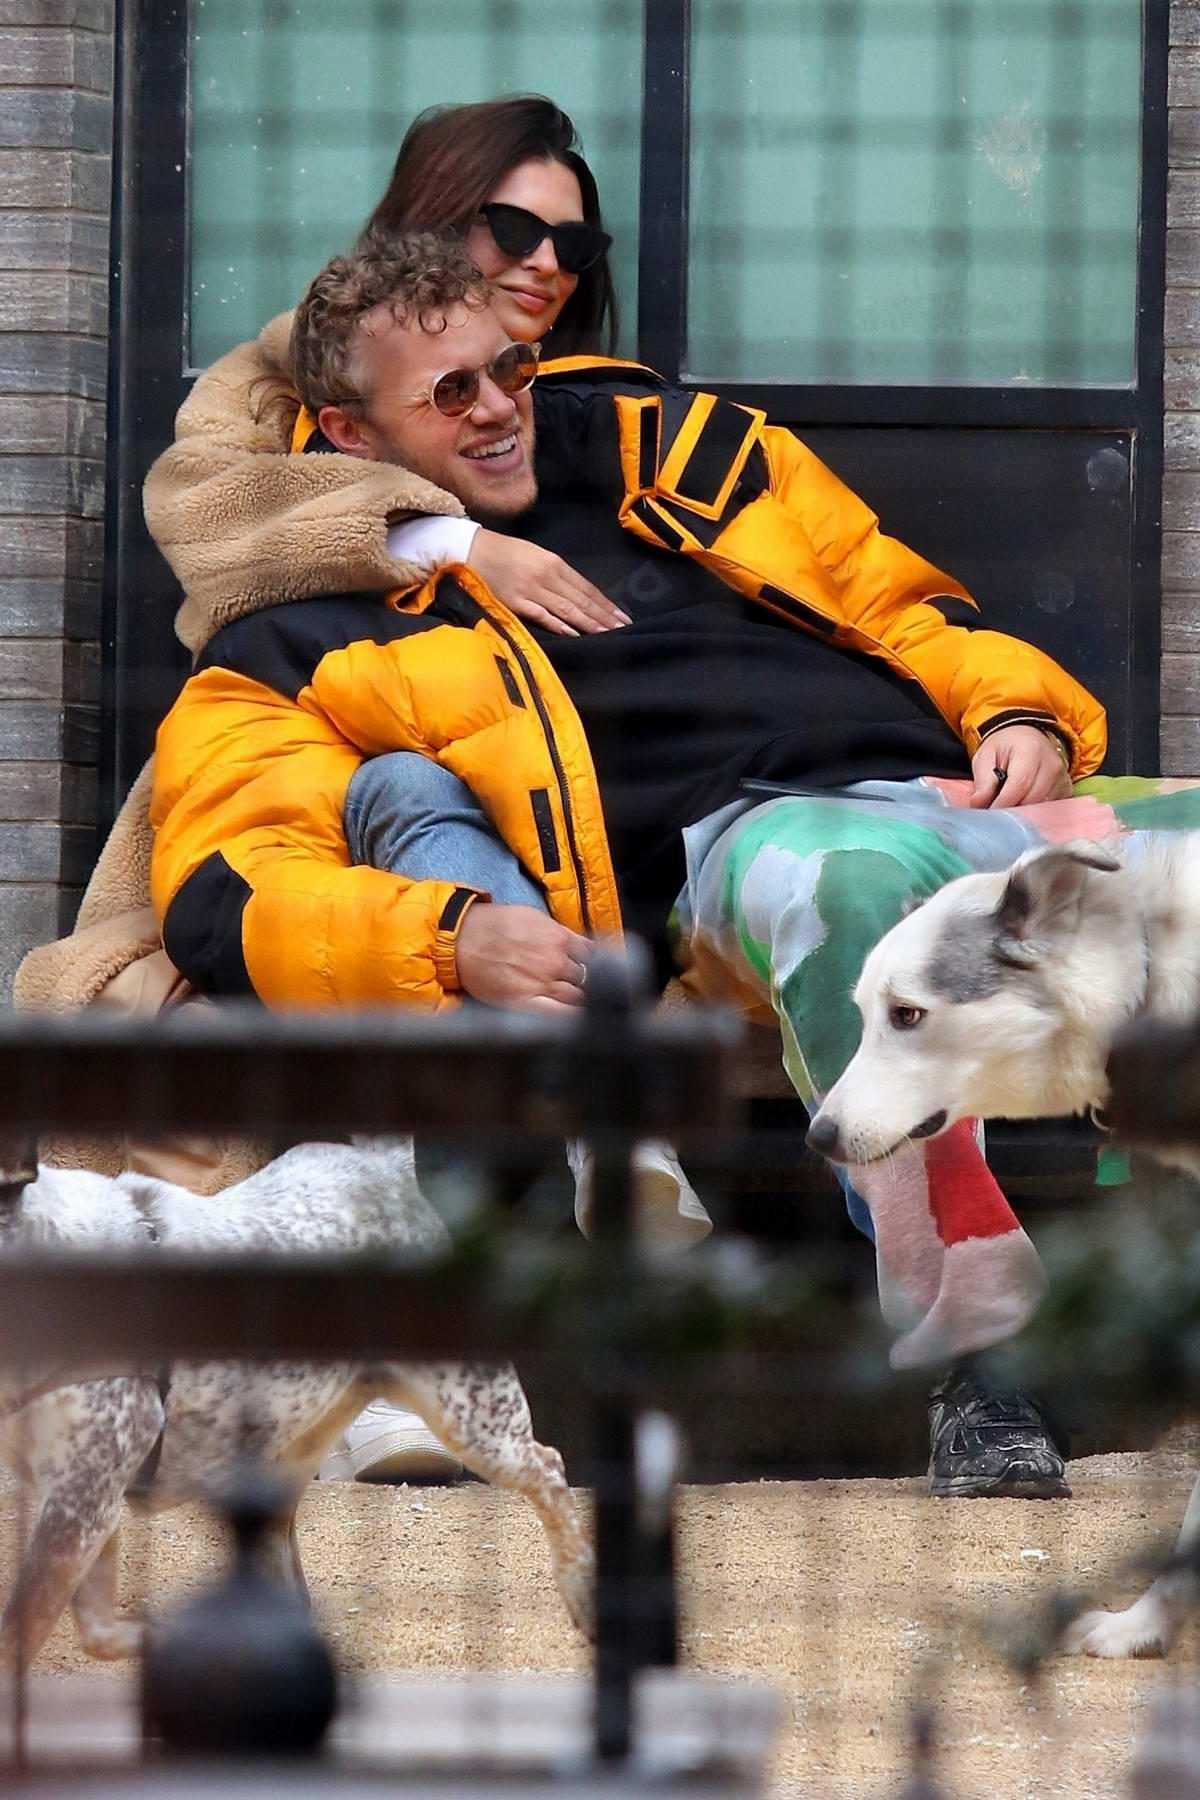 Emily Ratajkowski cuddles with Sebastian Bear-McClard while sharing a romantic moment at a dog park in New York City